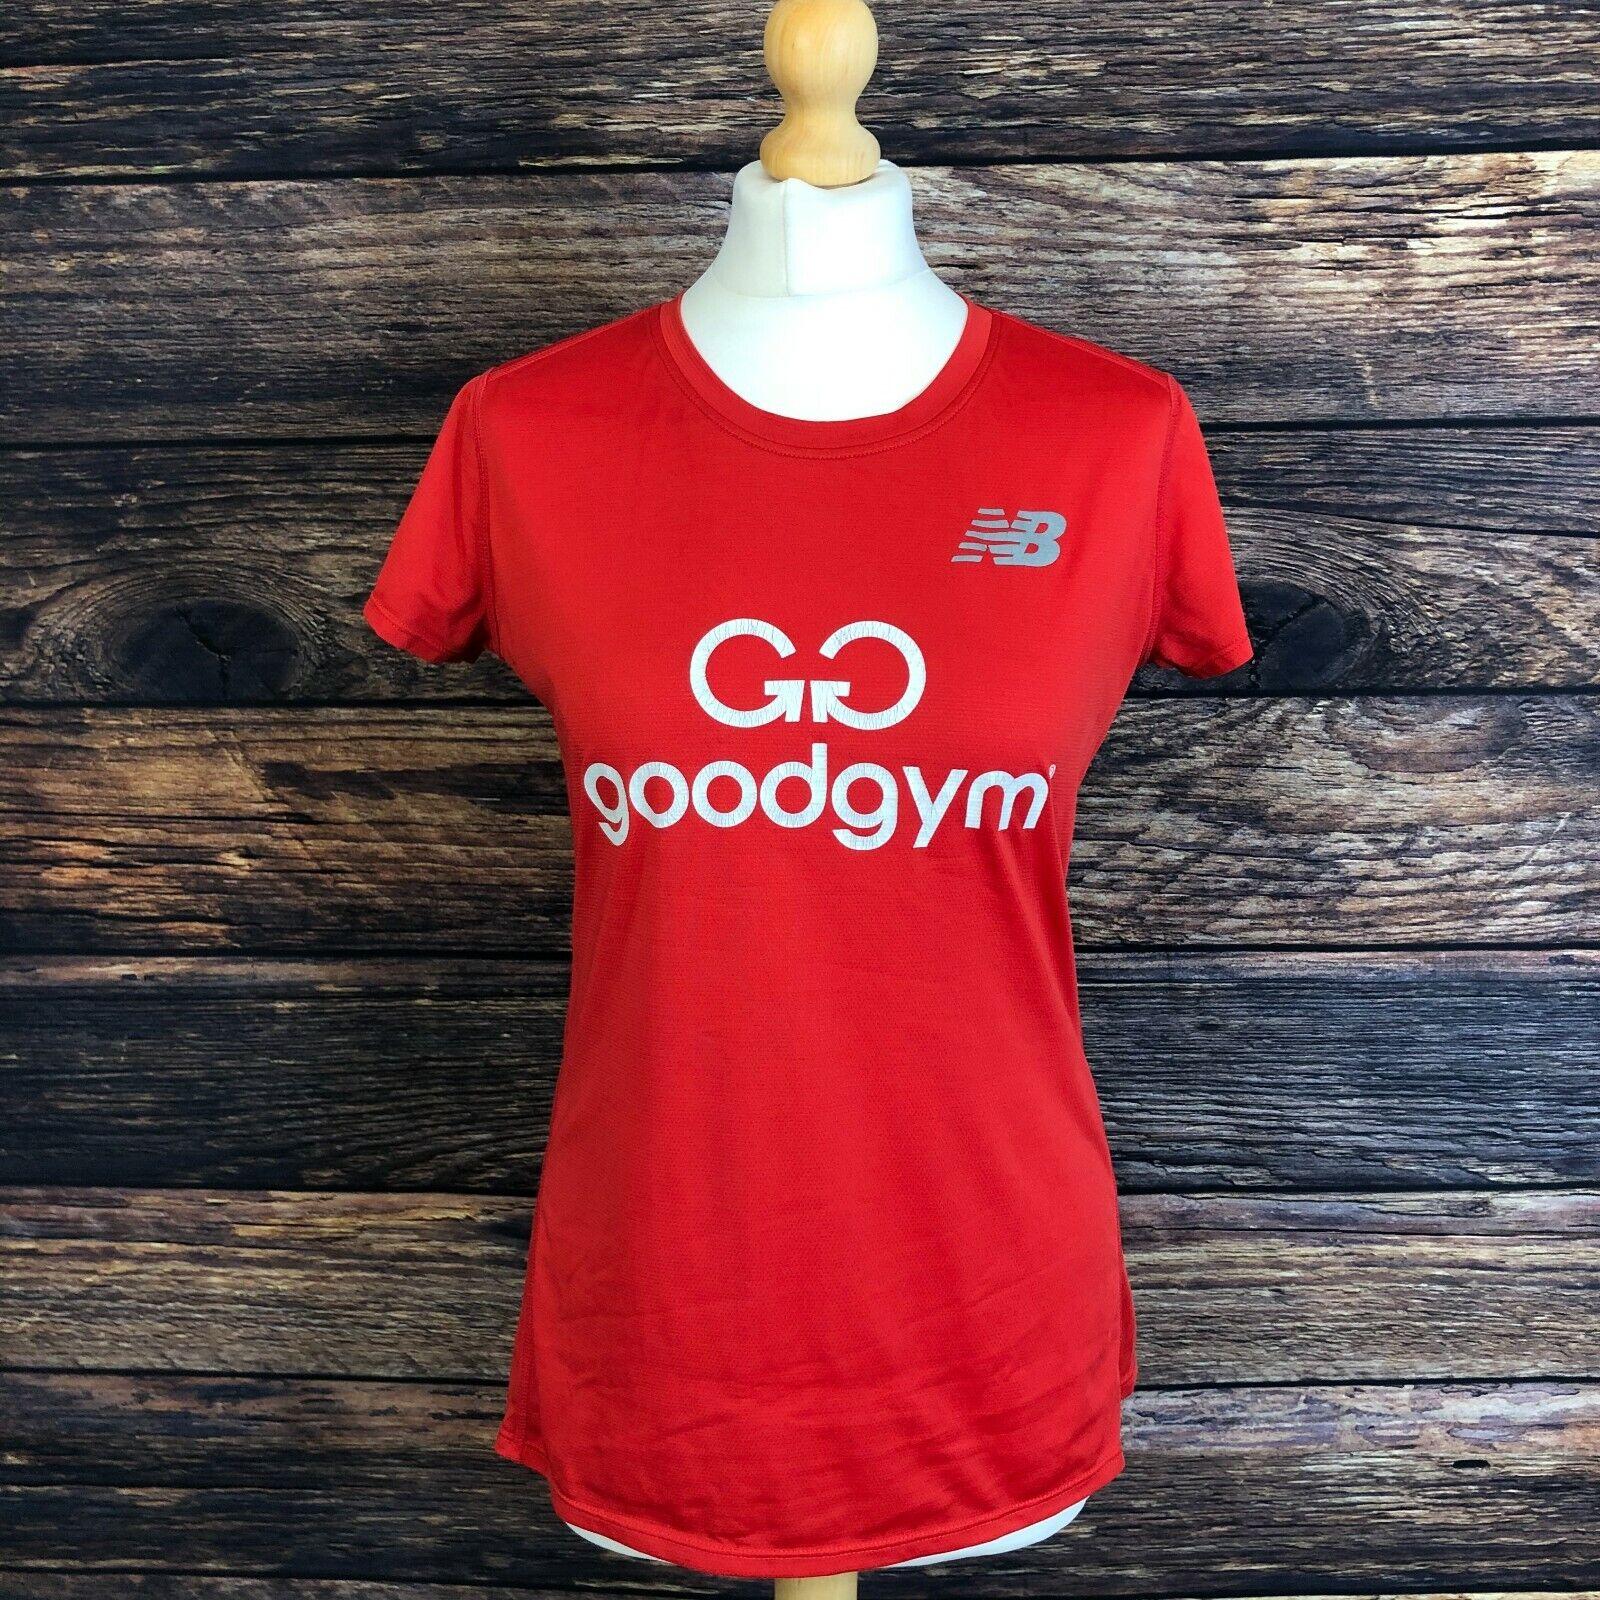 NB NEW BALANCE GoodGym Women's Red Gym Training Running T Shirt Size Medium